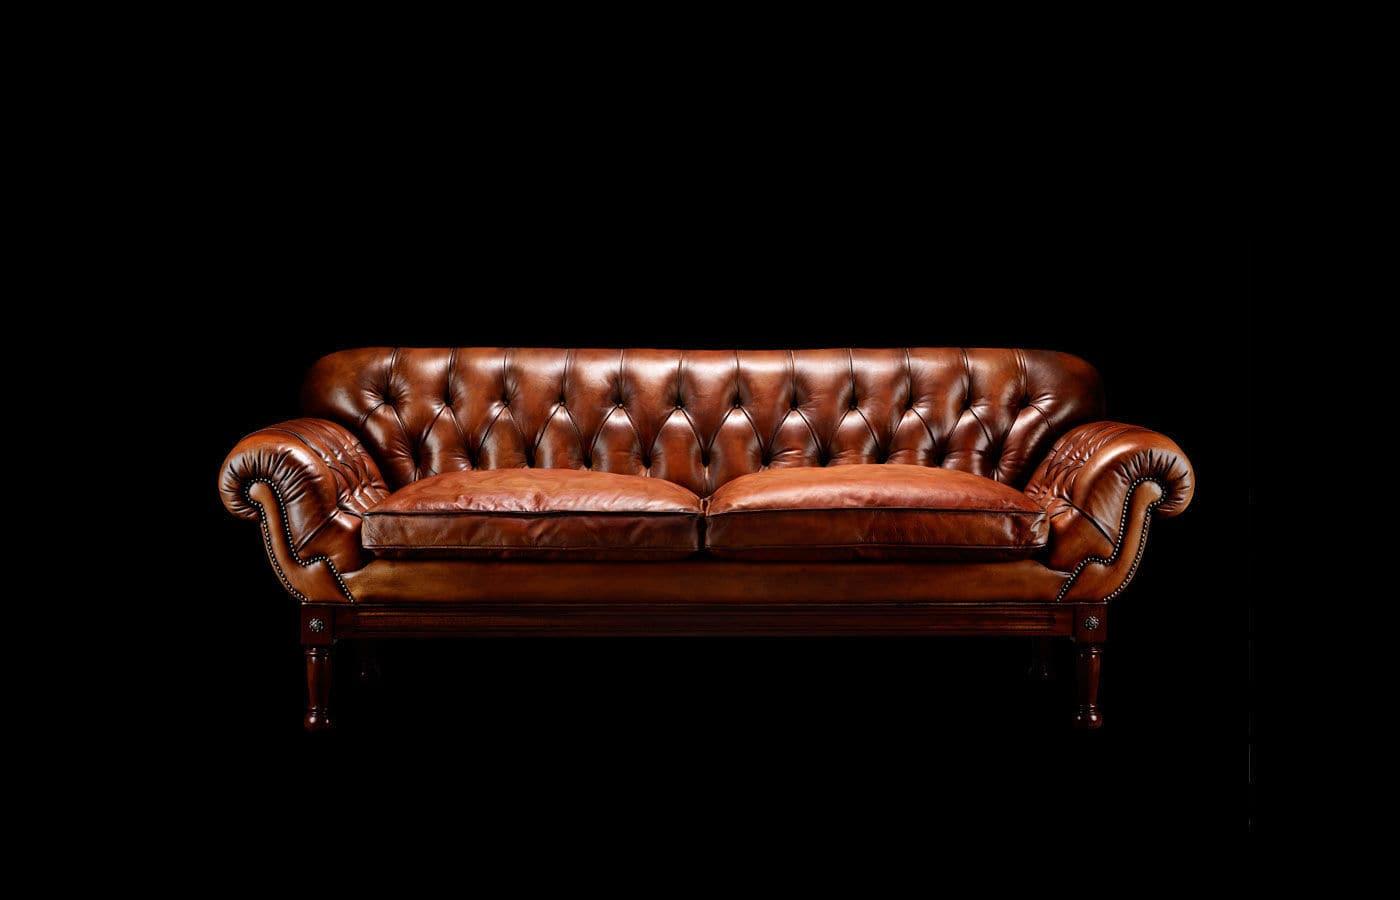 William Blake Chesterfield Sofa chesterfield sofa / leather / 2-person / brown - john